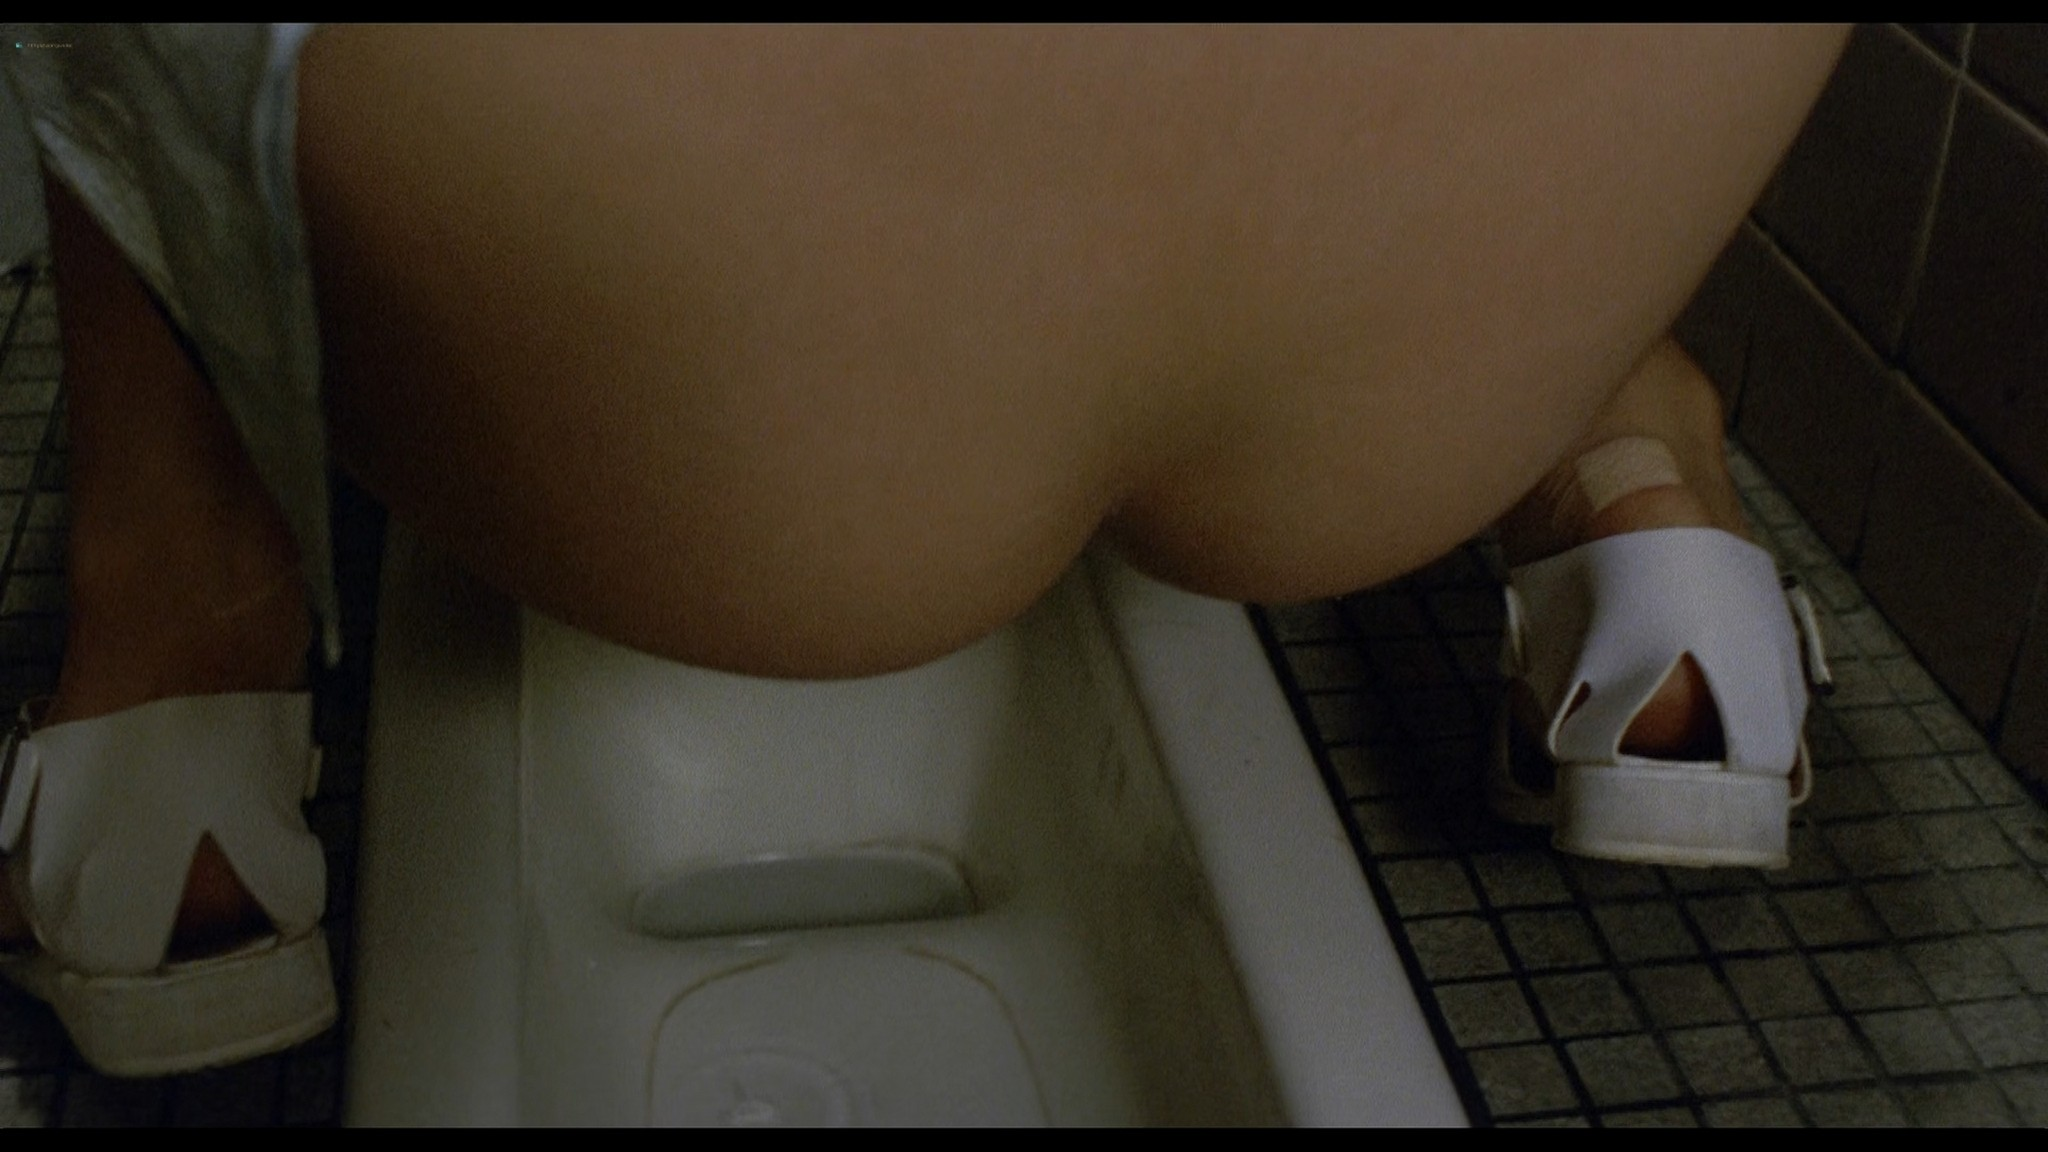 Natsuko Yamamoto nude Kaoru Oda nude lot of sex Beautiful Wrestlers Down for the Count JP 1984 1080p BluRay REMUX 13